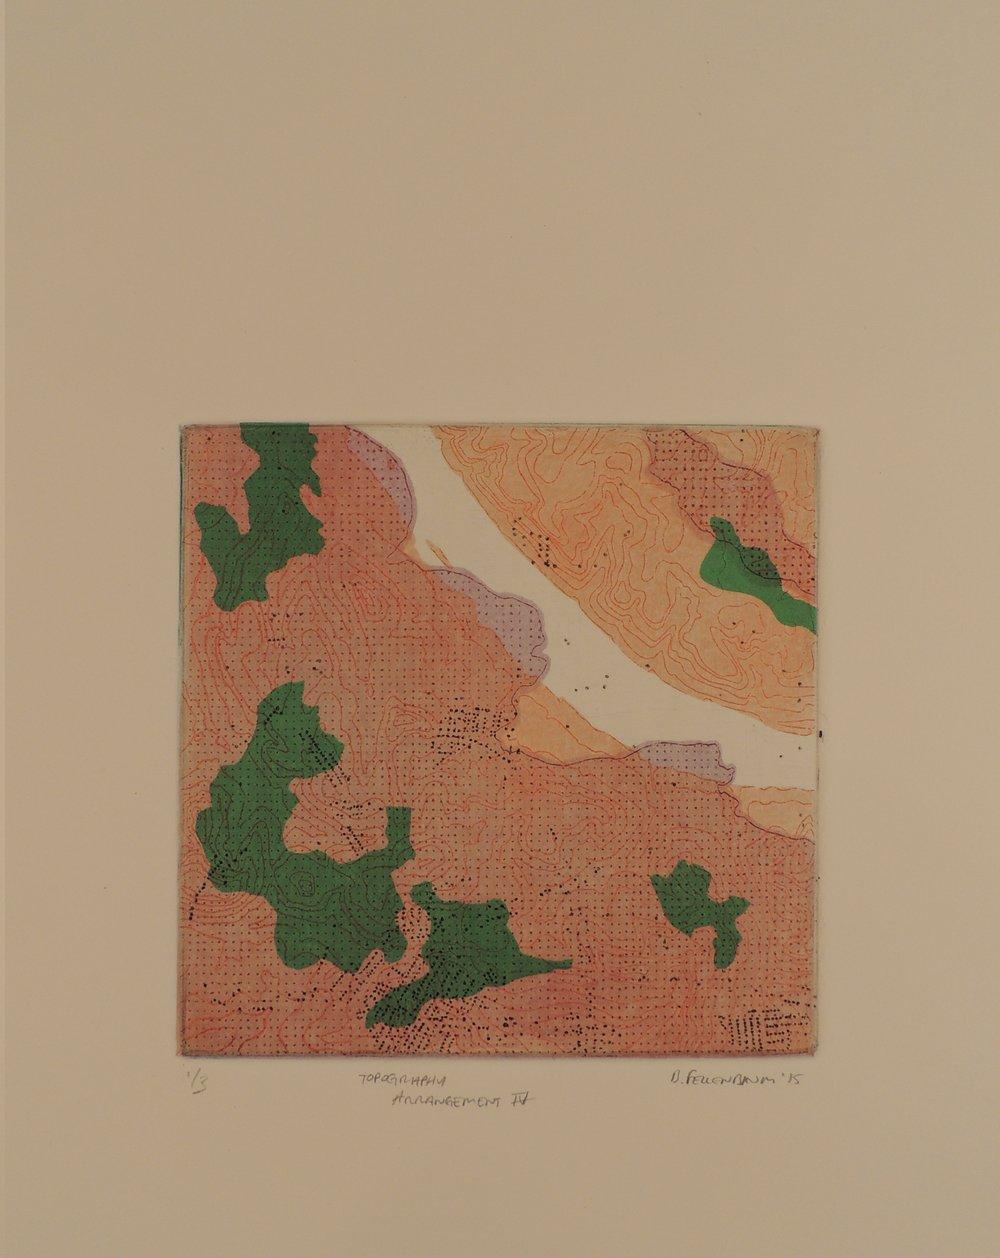 Topography Arrangement IV